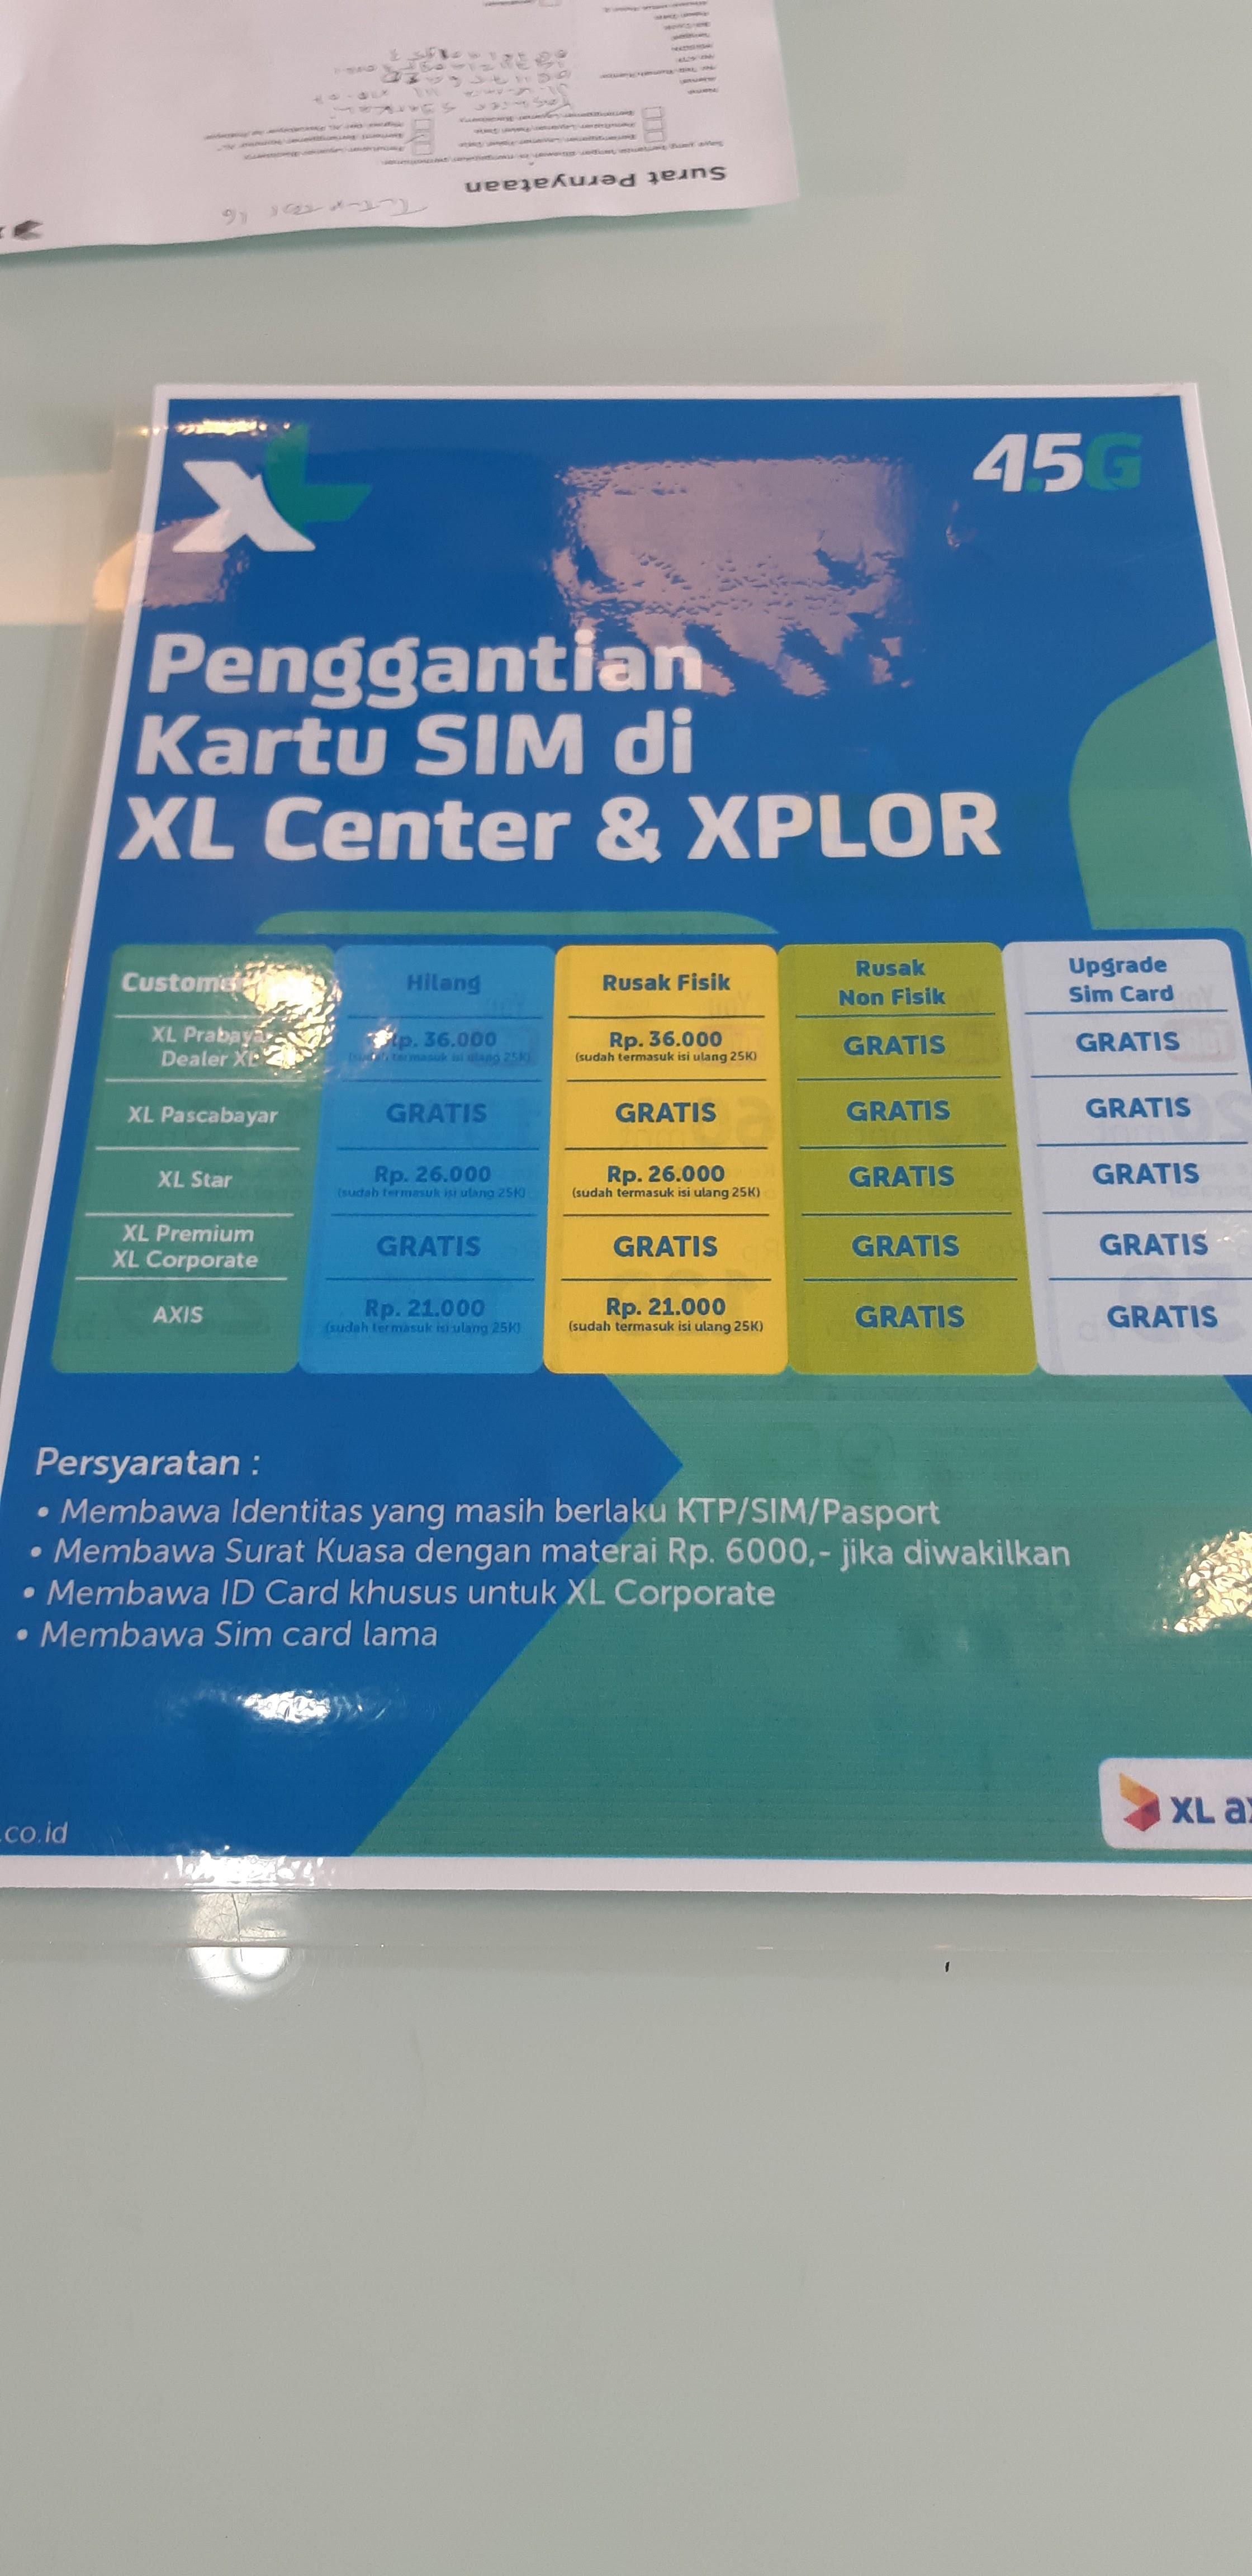 XL Center Pekanbaru